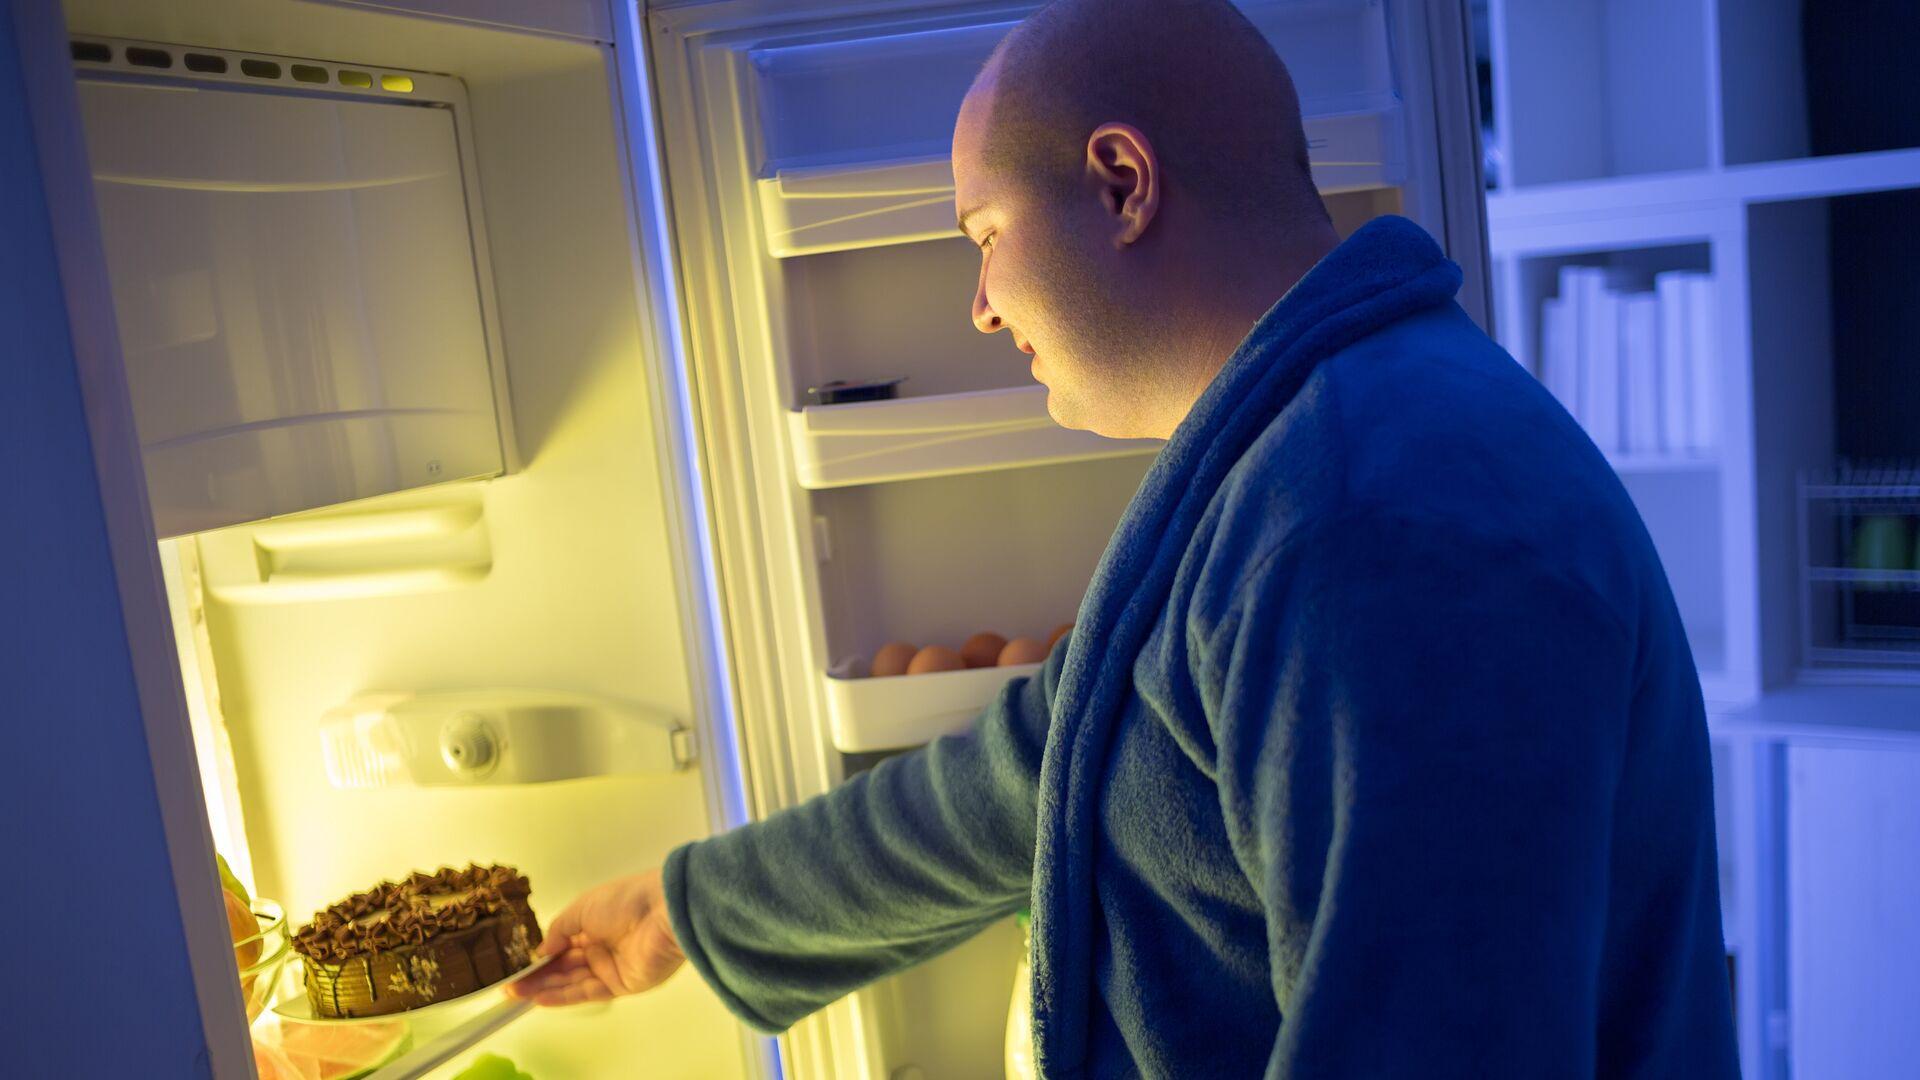 Толстый мужчина у холодильника - РИА Новости, 1920, 14.01.2021